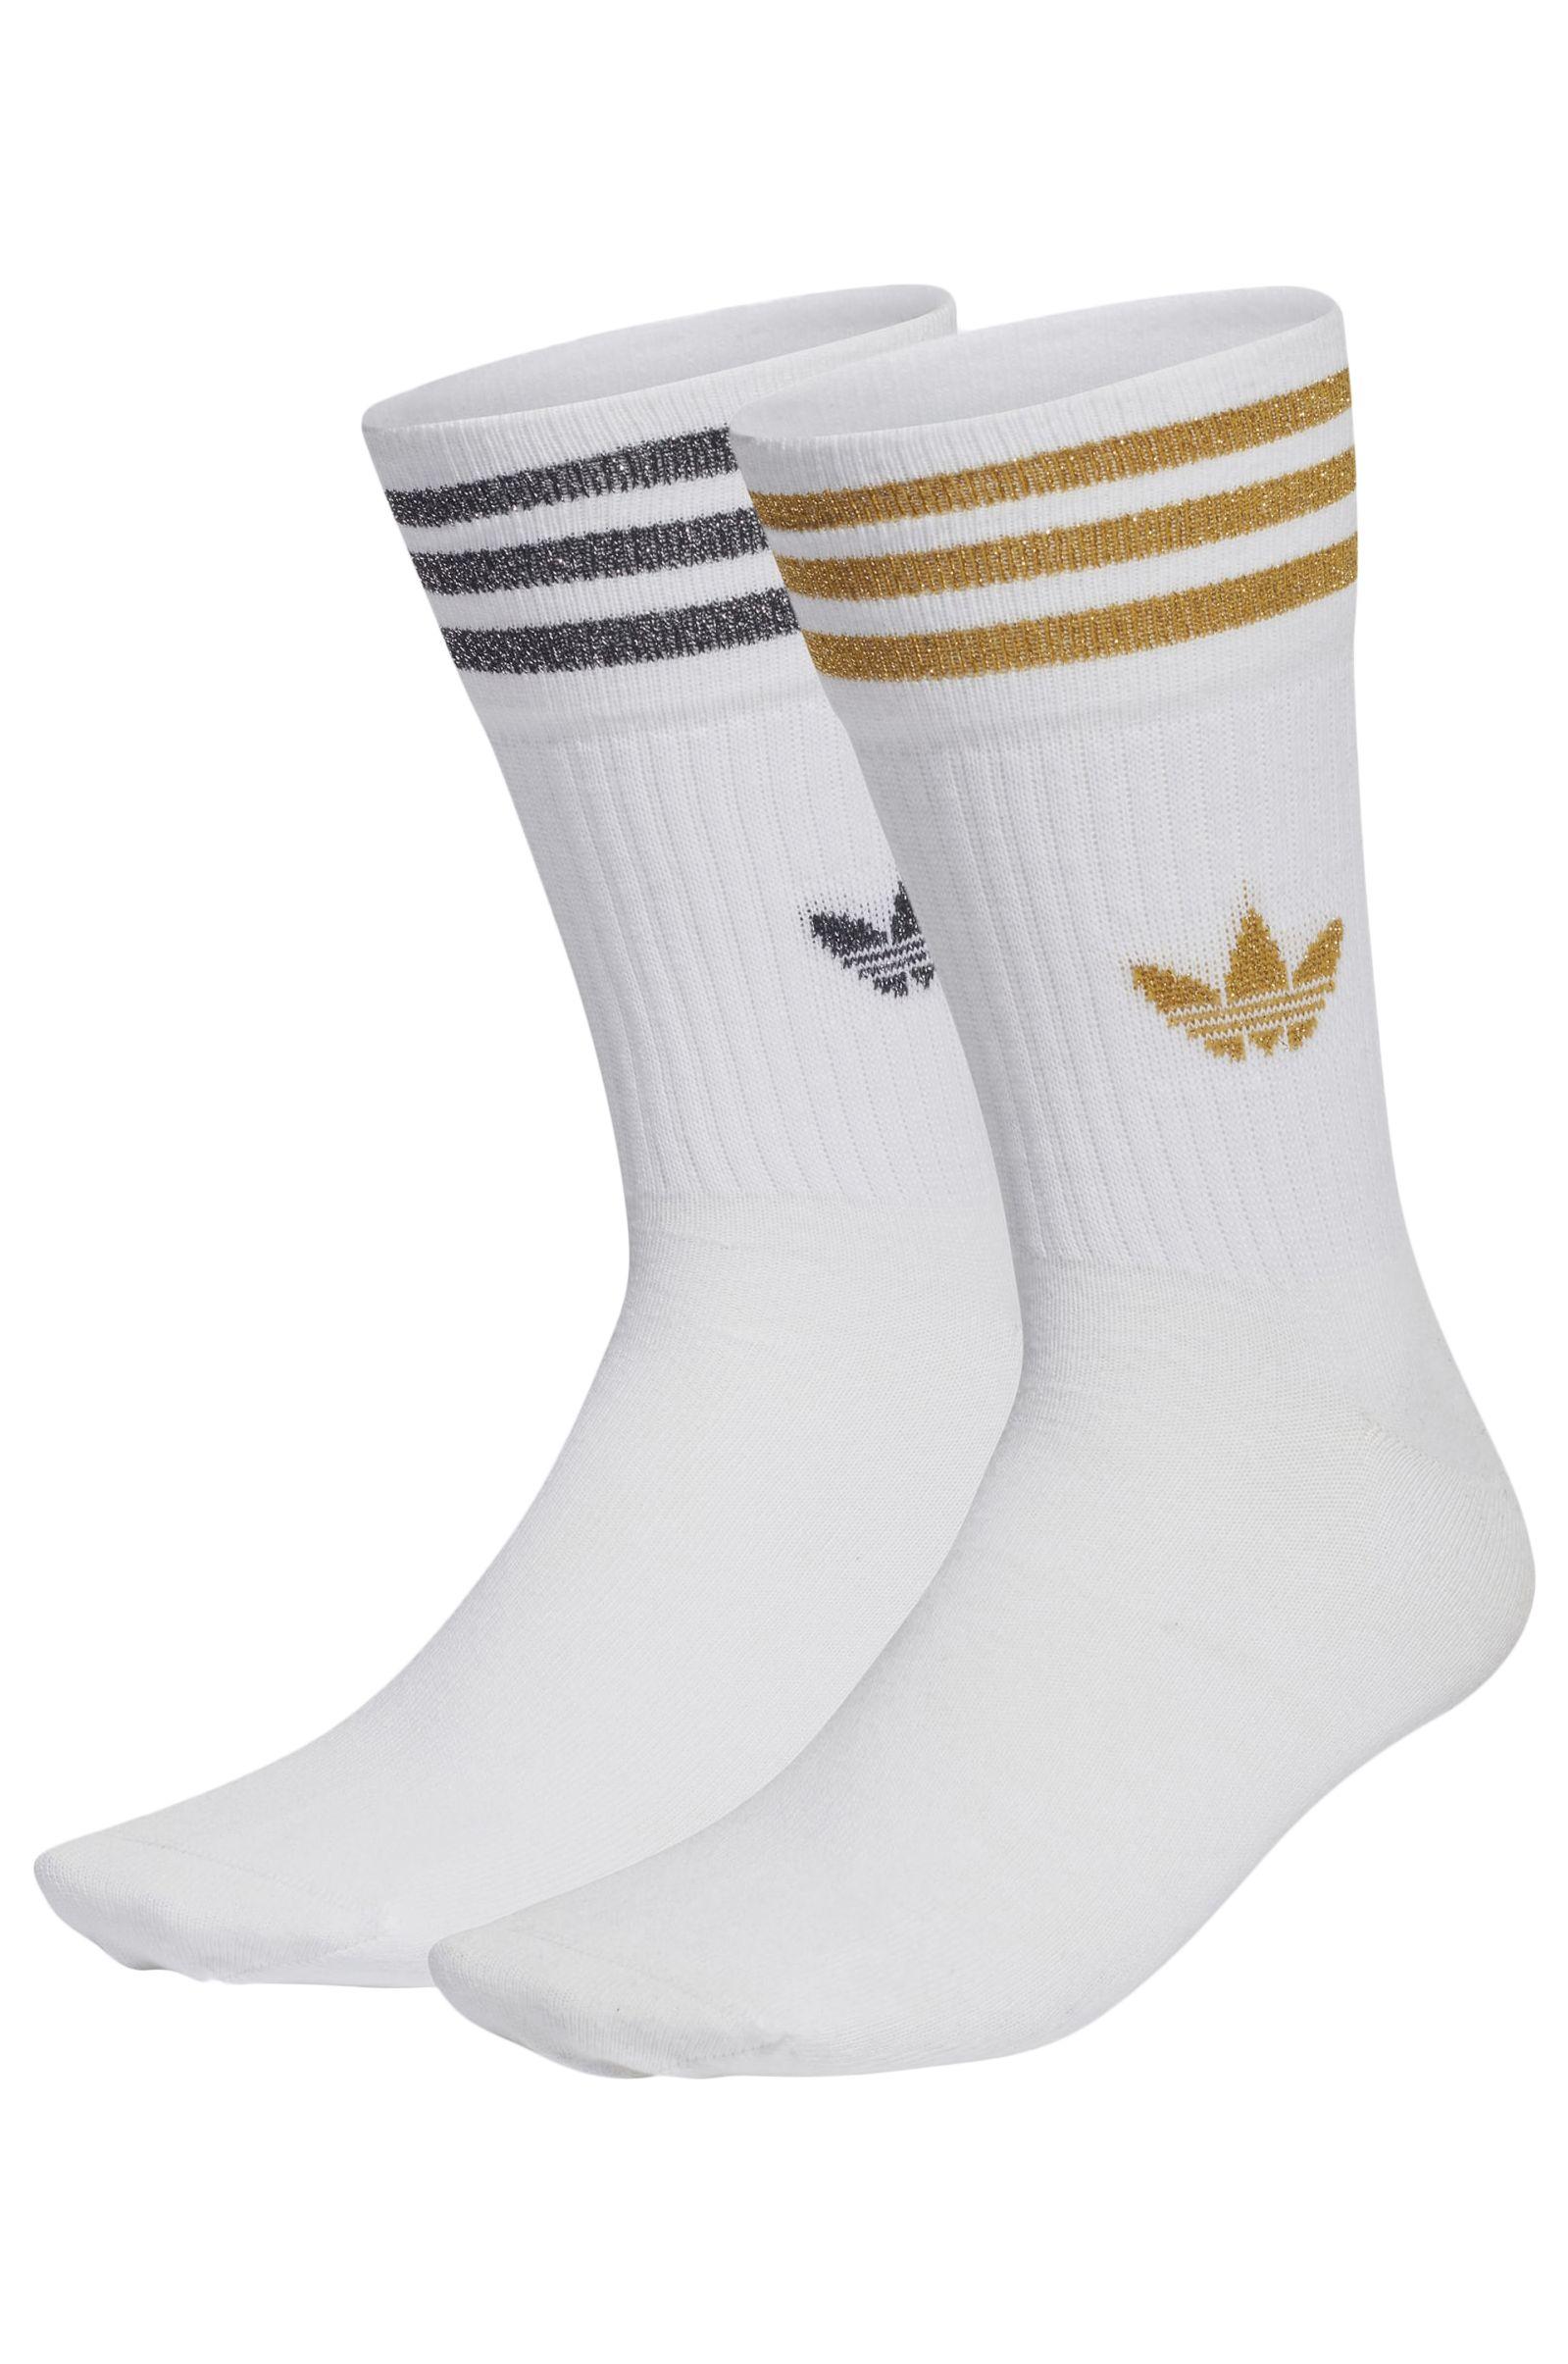 Adidas Socks MID CUT GLT SCK White